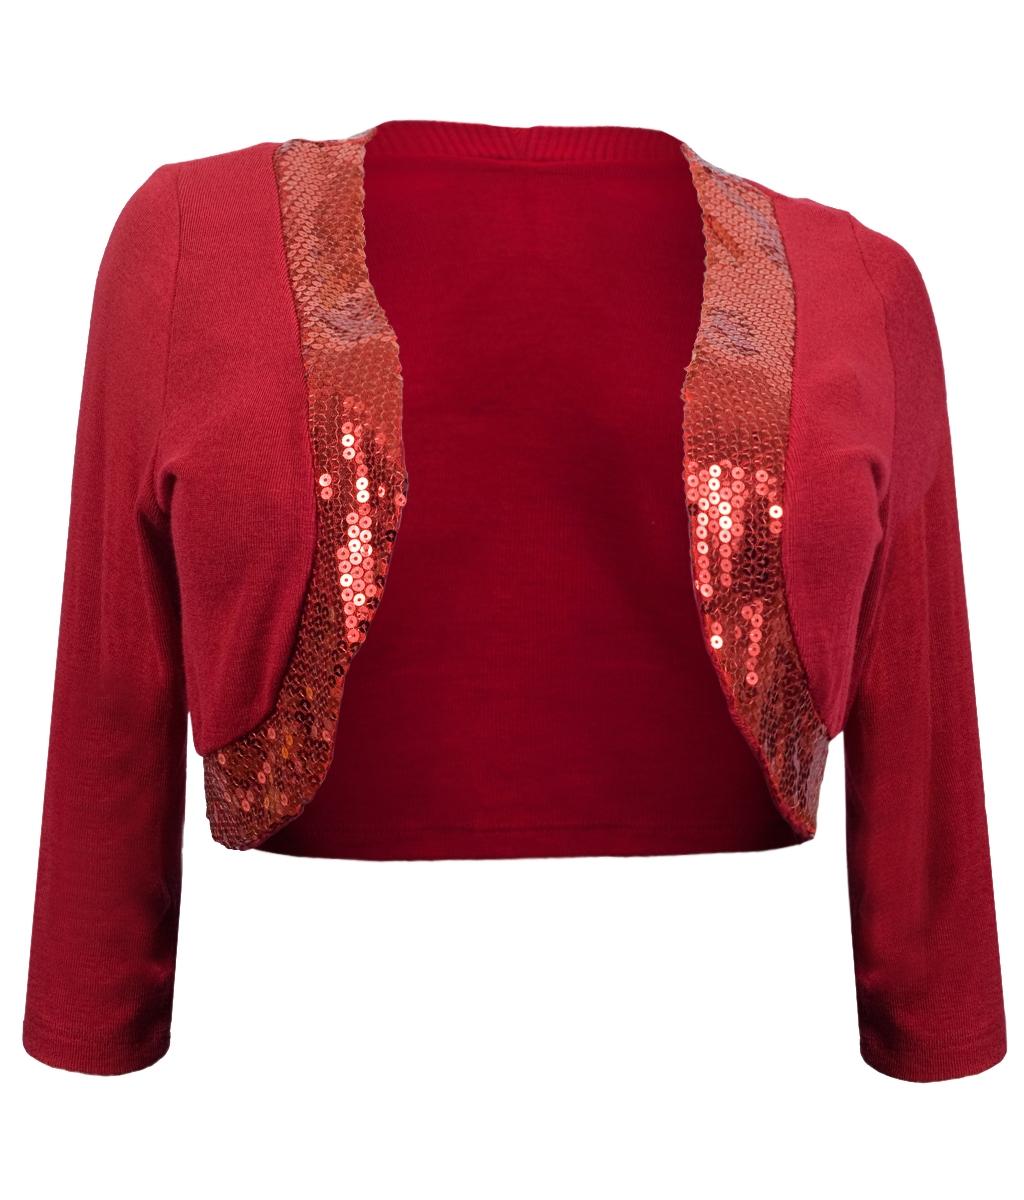 Womens' Sequin Trim 3/4 Sleeve Cropped Bolero Shrug Red